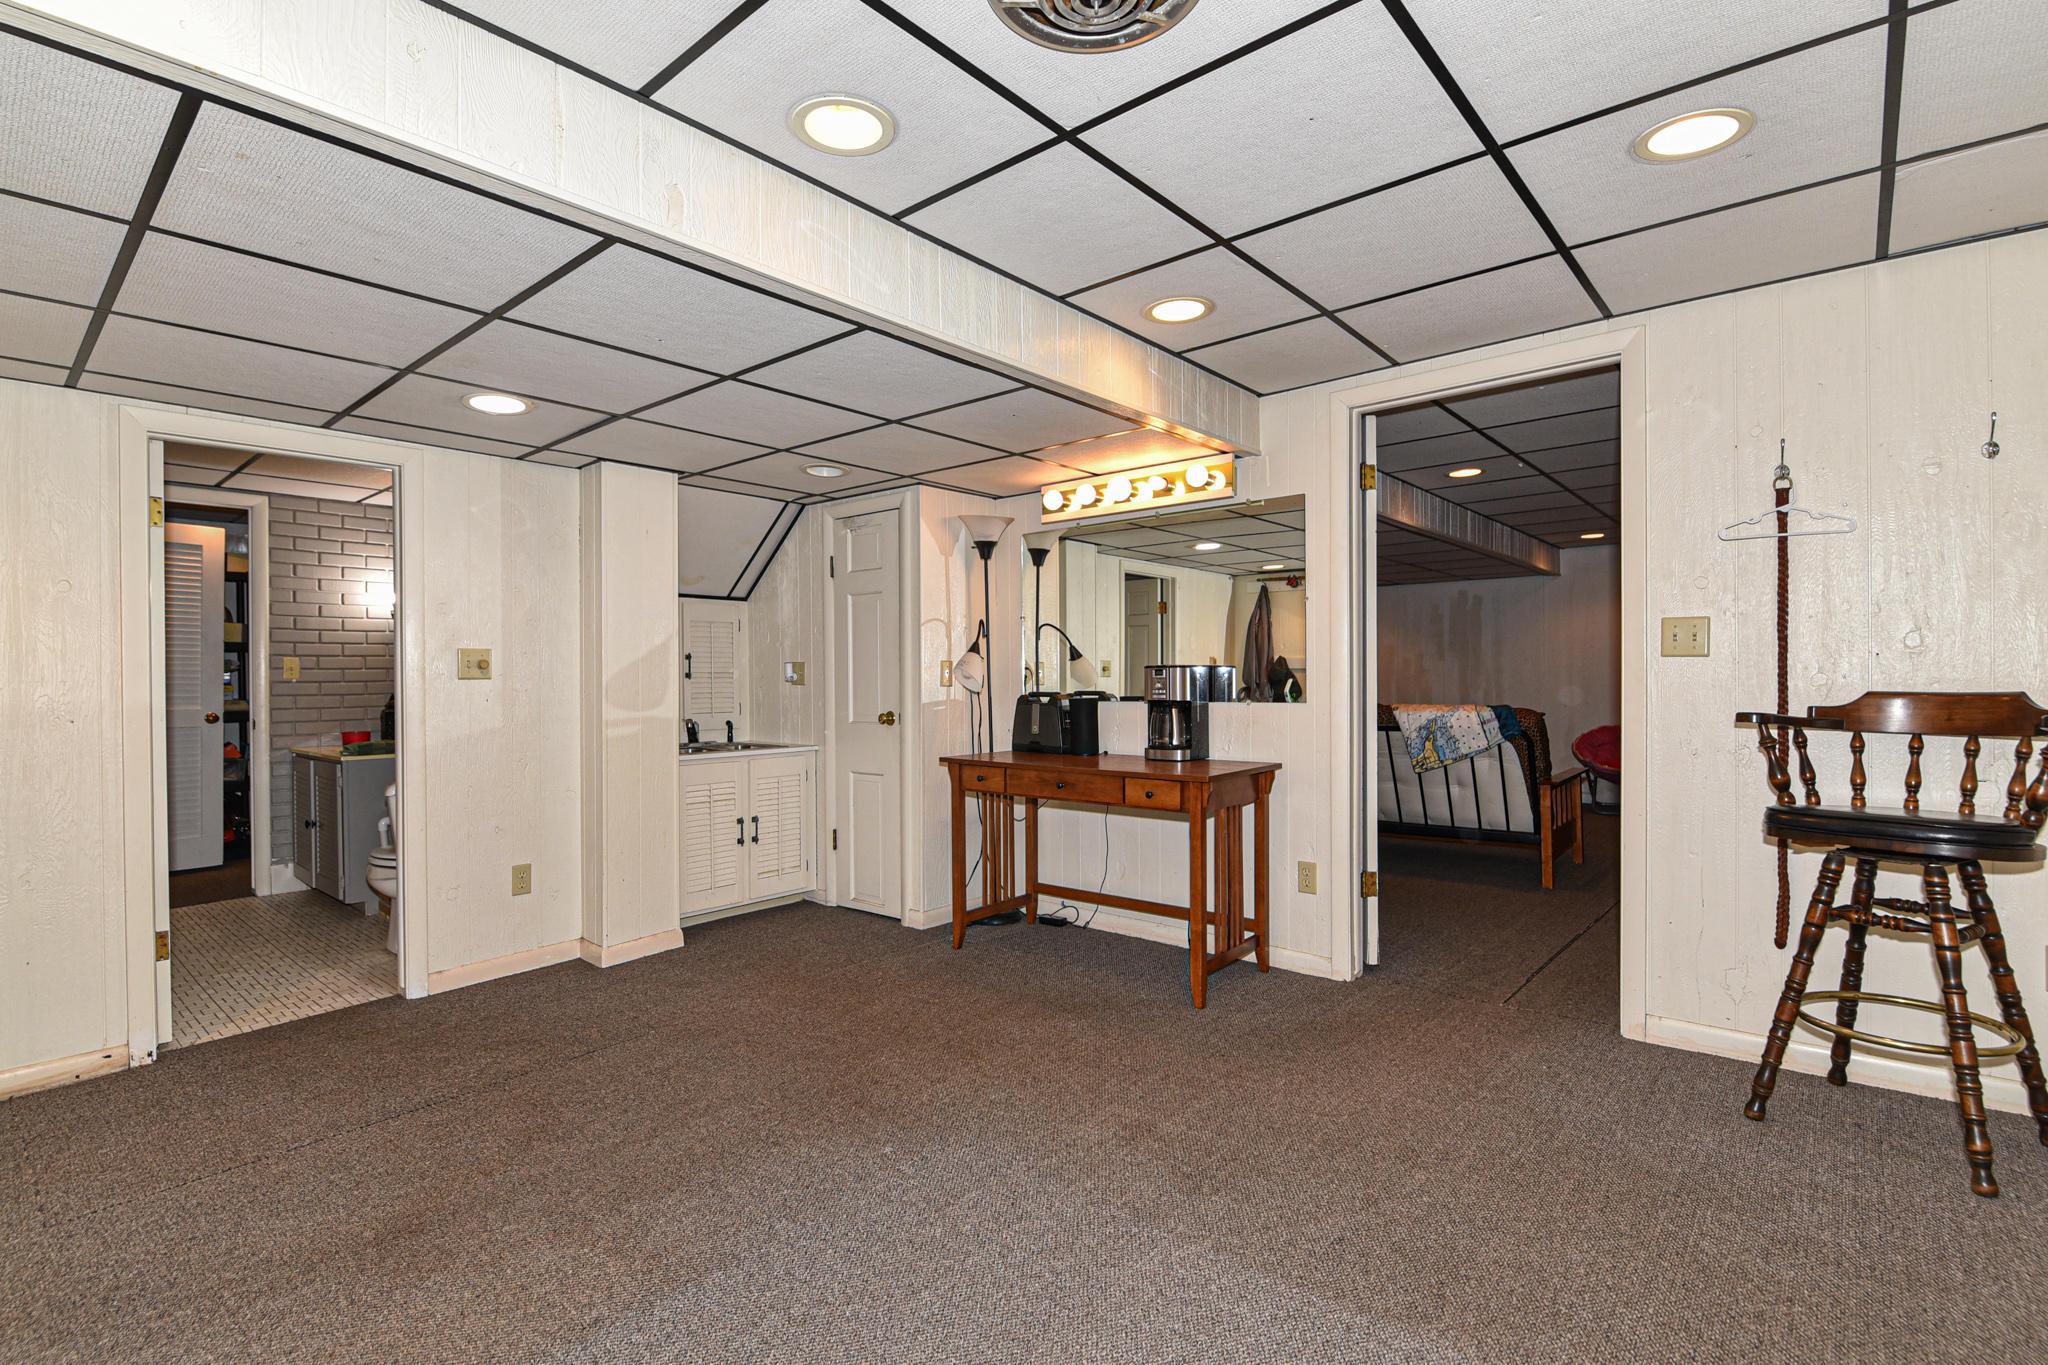 Lower bedroom,den or office